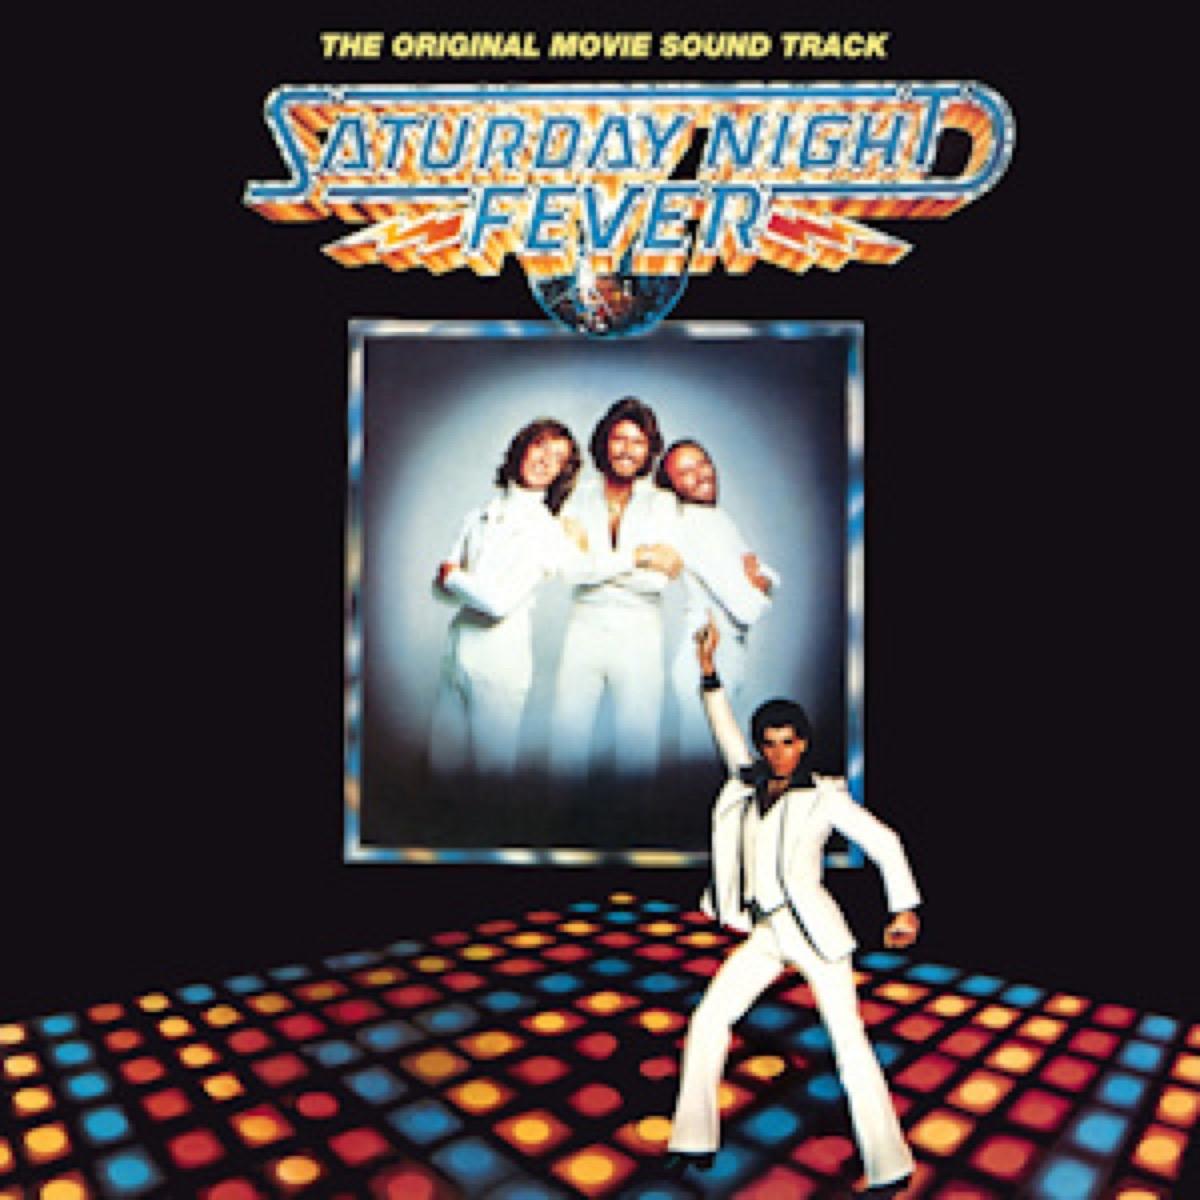 saturday night fever movie soundtrack